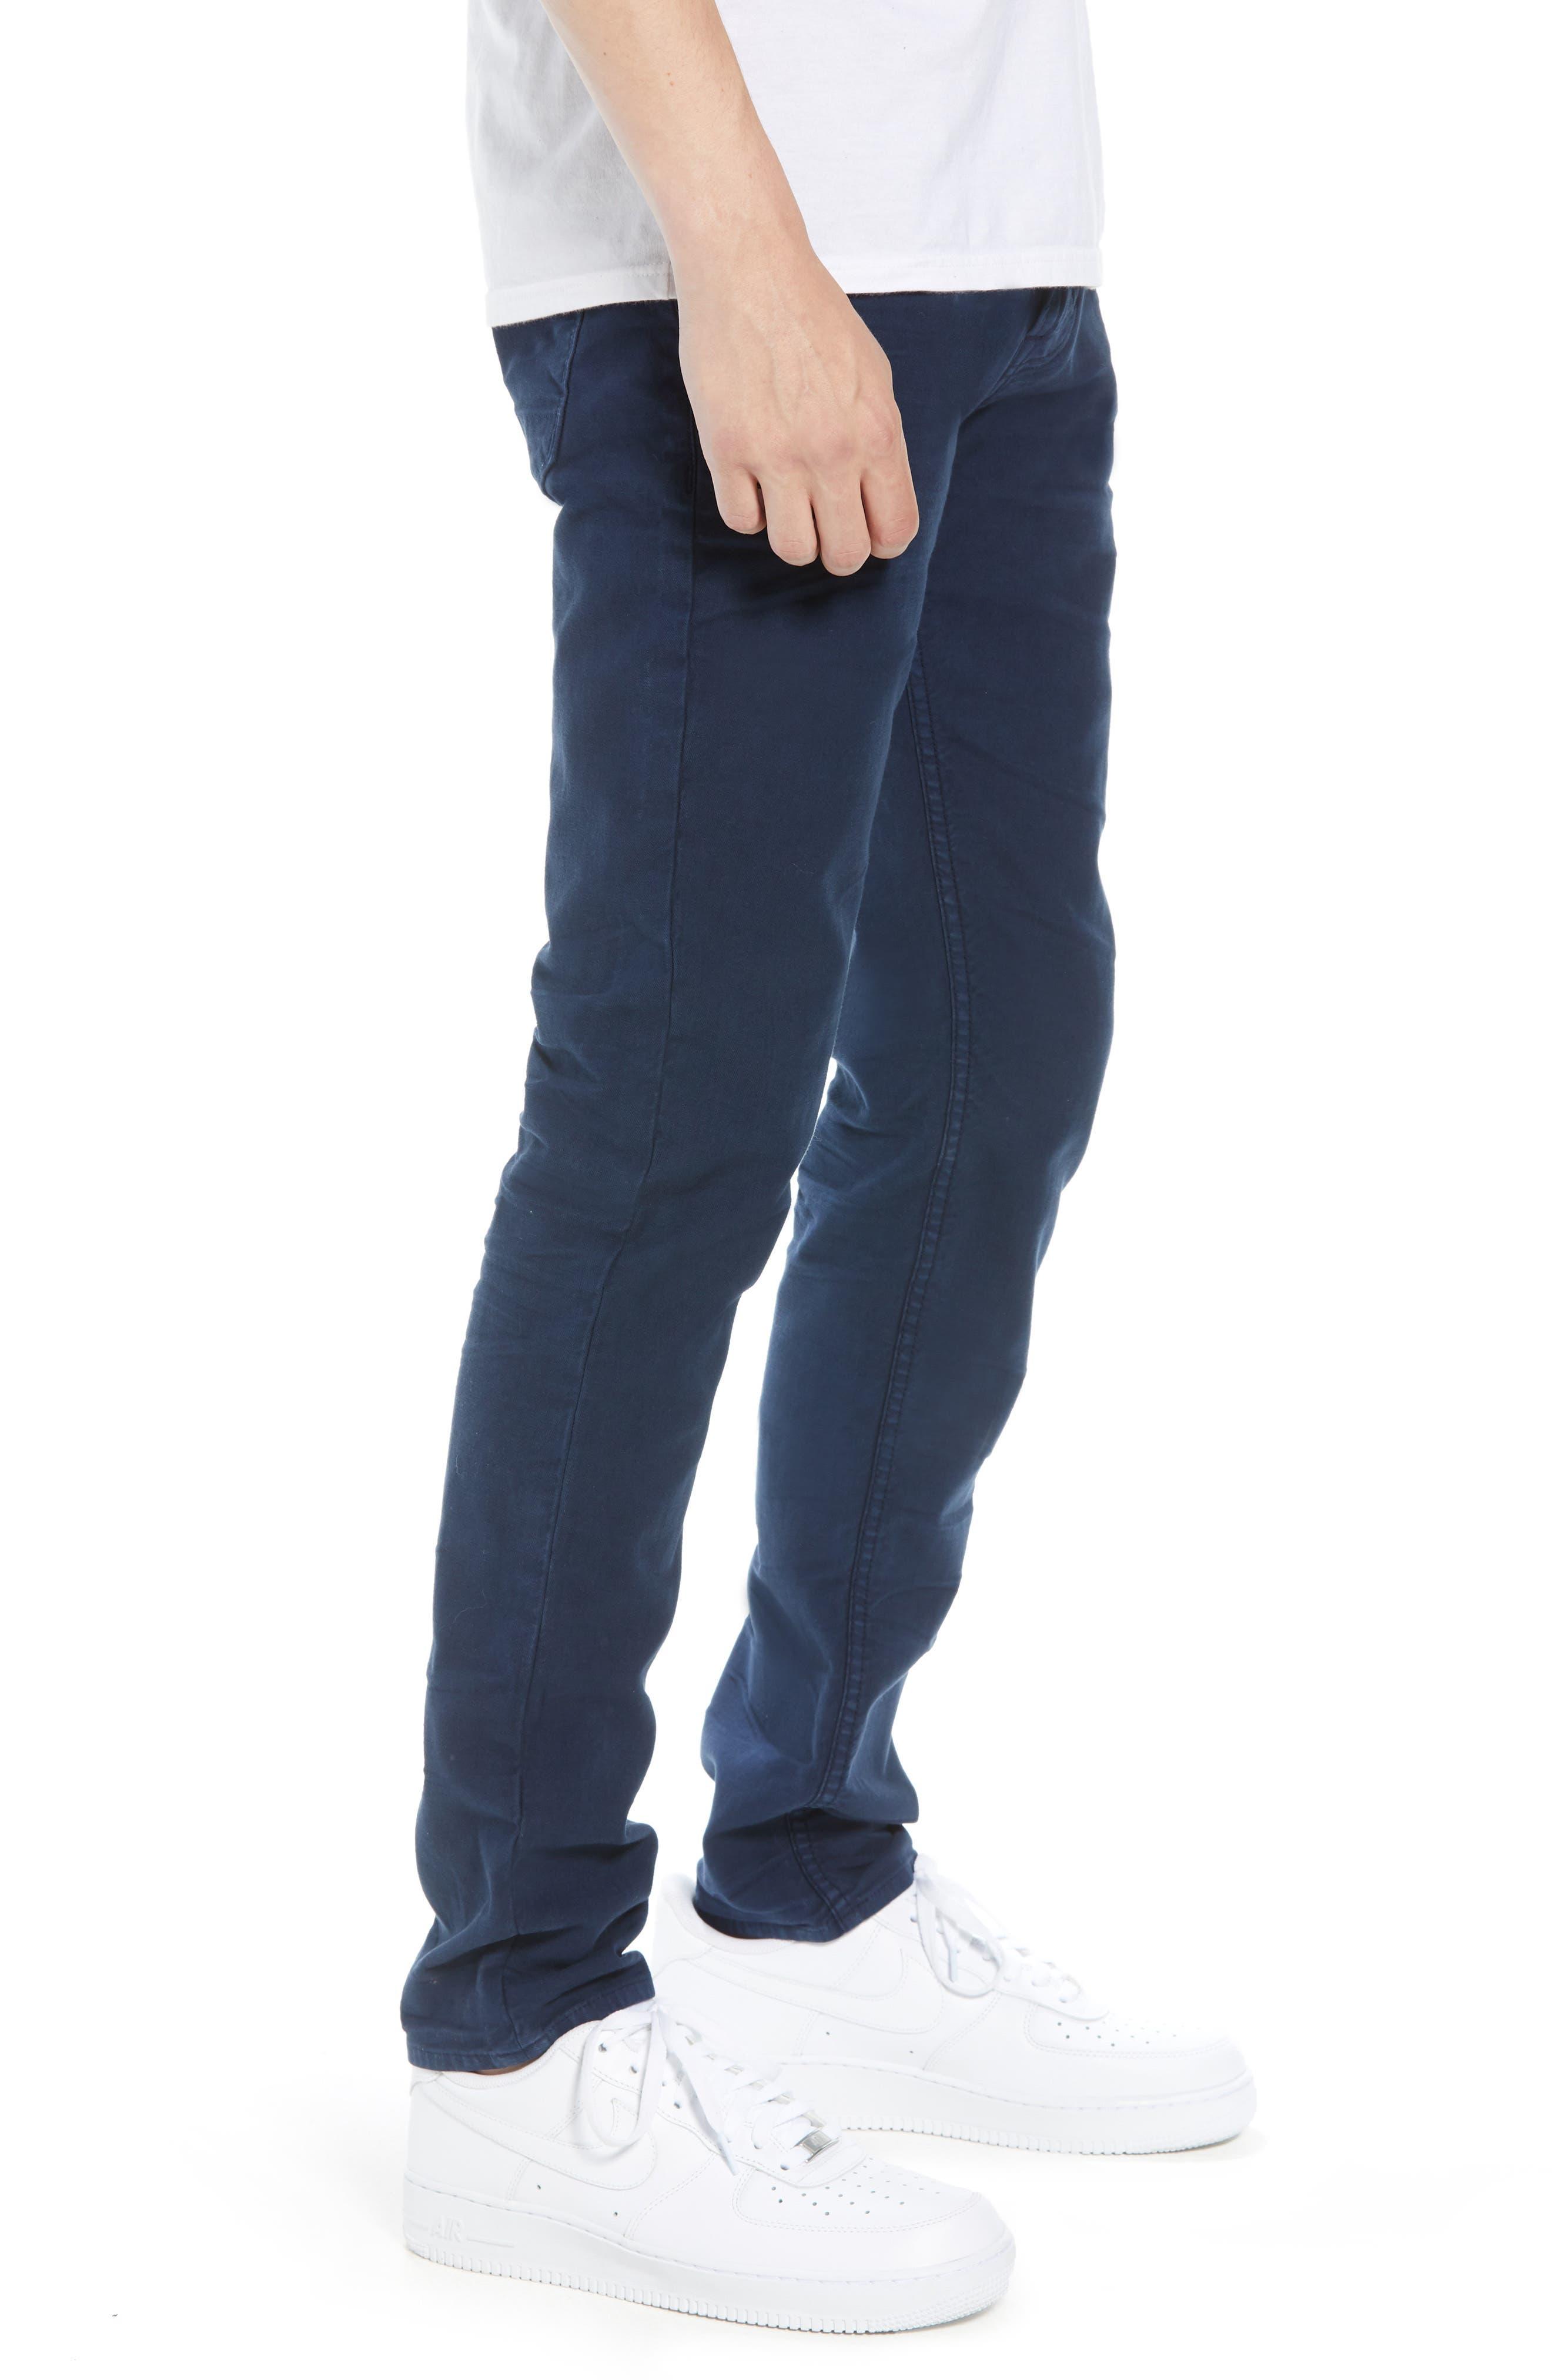 HUDSON JEANS, Axl Skinny Fit Jeans, Alternate thumbnail 3, color, SAILOR BLUE